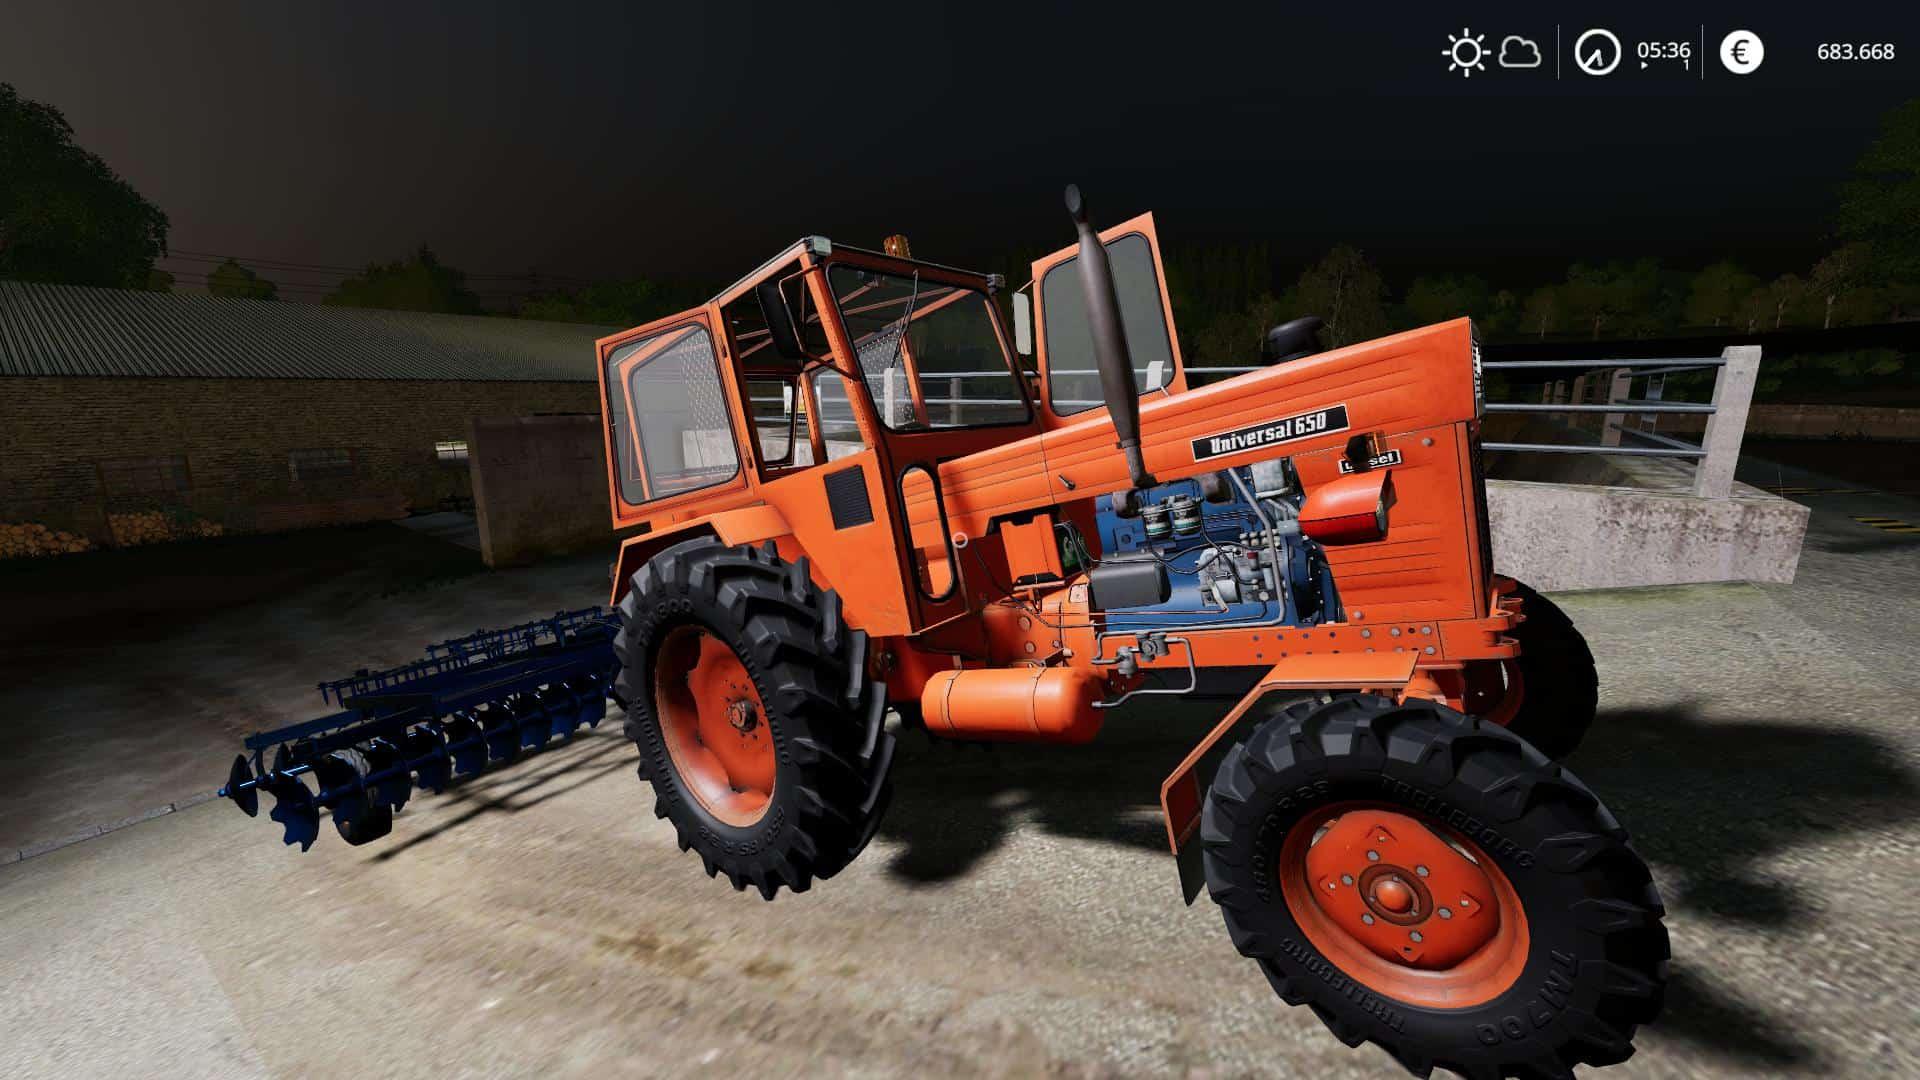 Romanian Disc GD Harrow v1 0 0 0 Mod - Farming Simulator 2015 / 15 mod